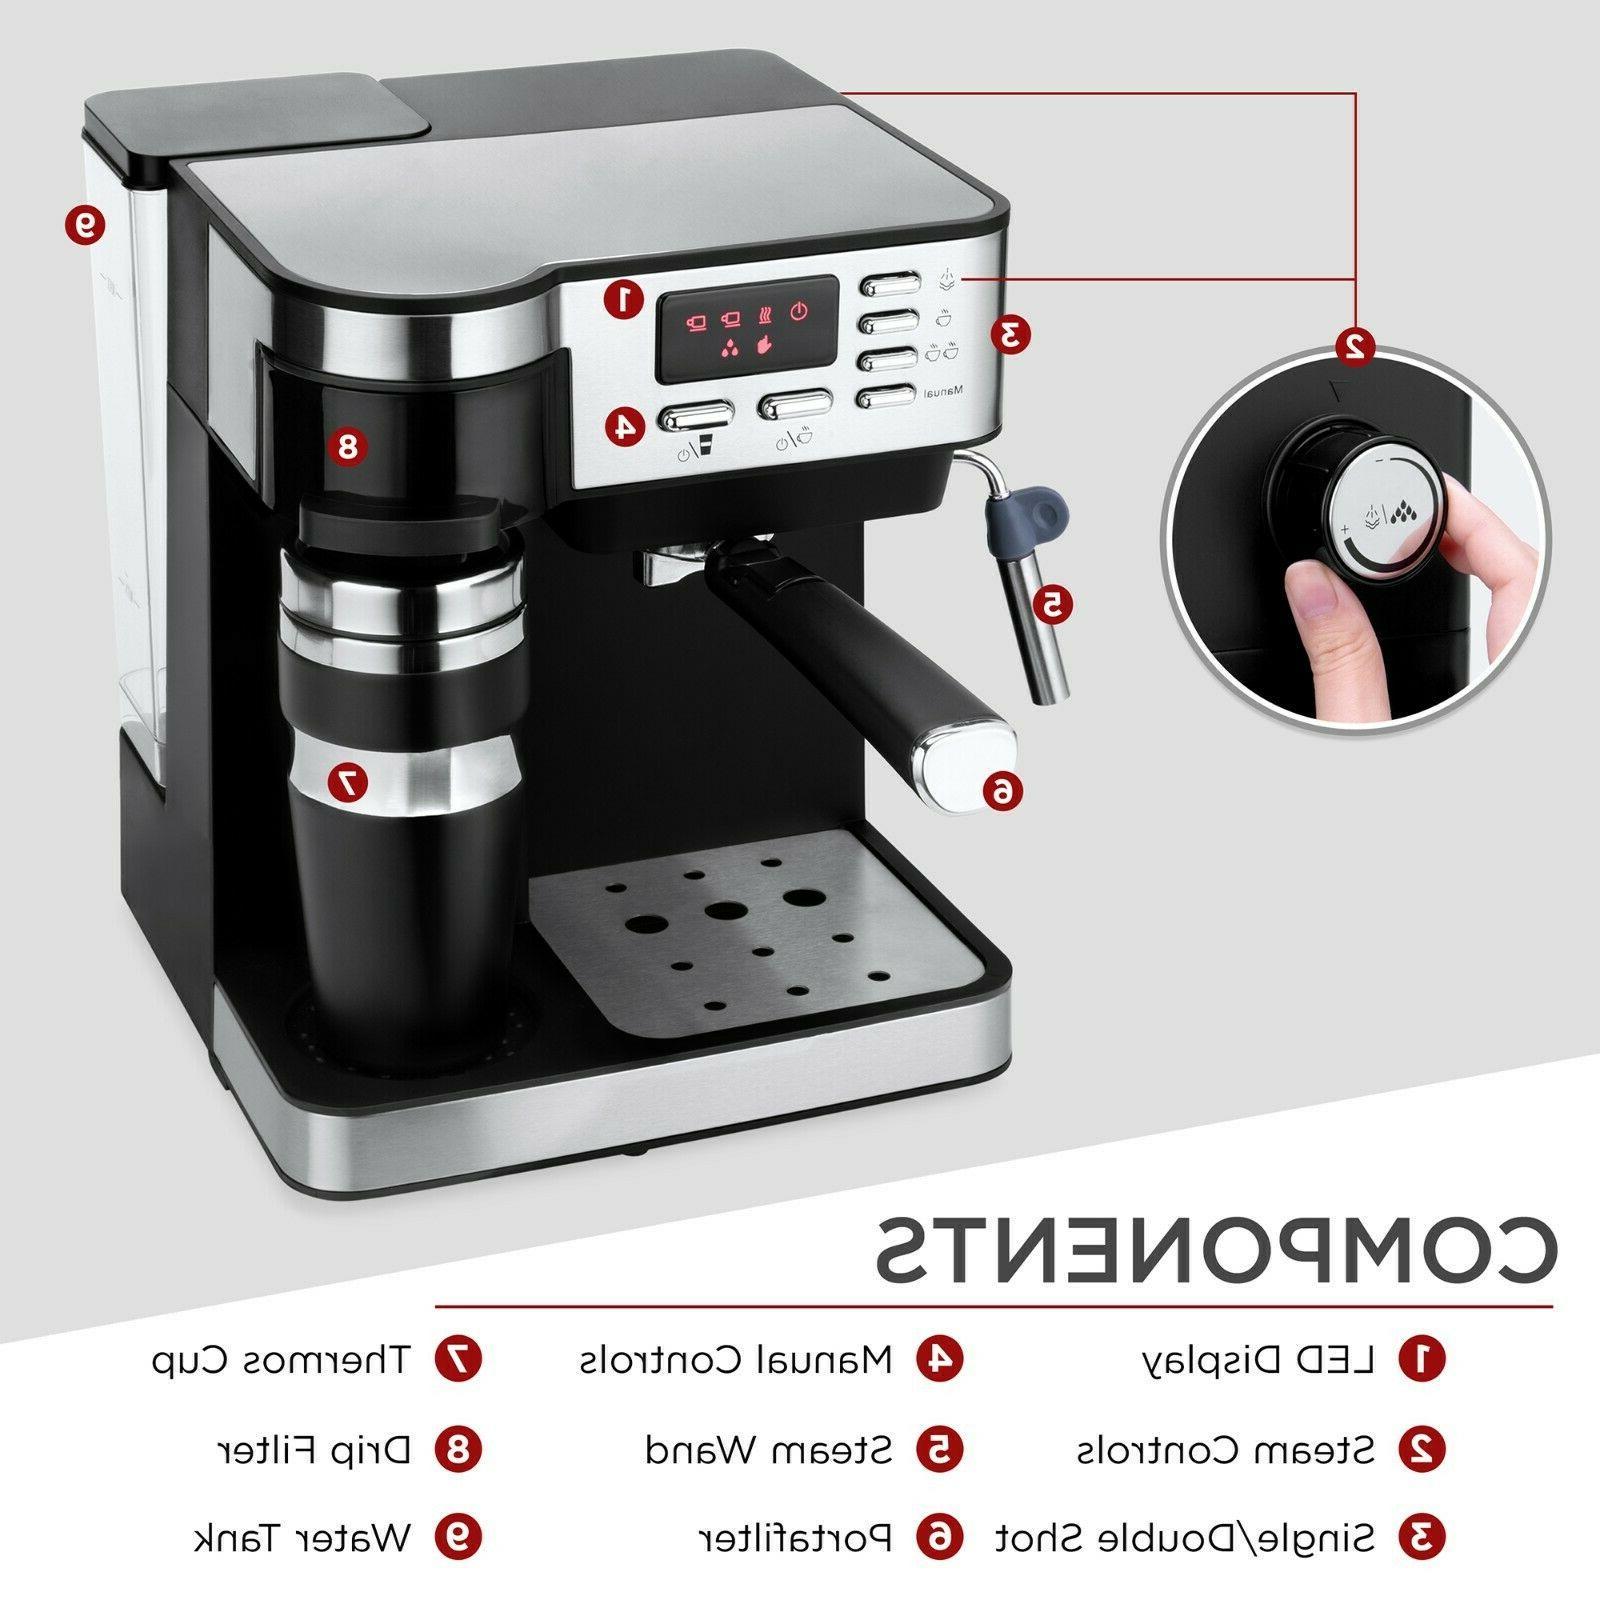 3-in-1 and Cappuccino Latte Machine